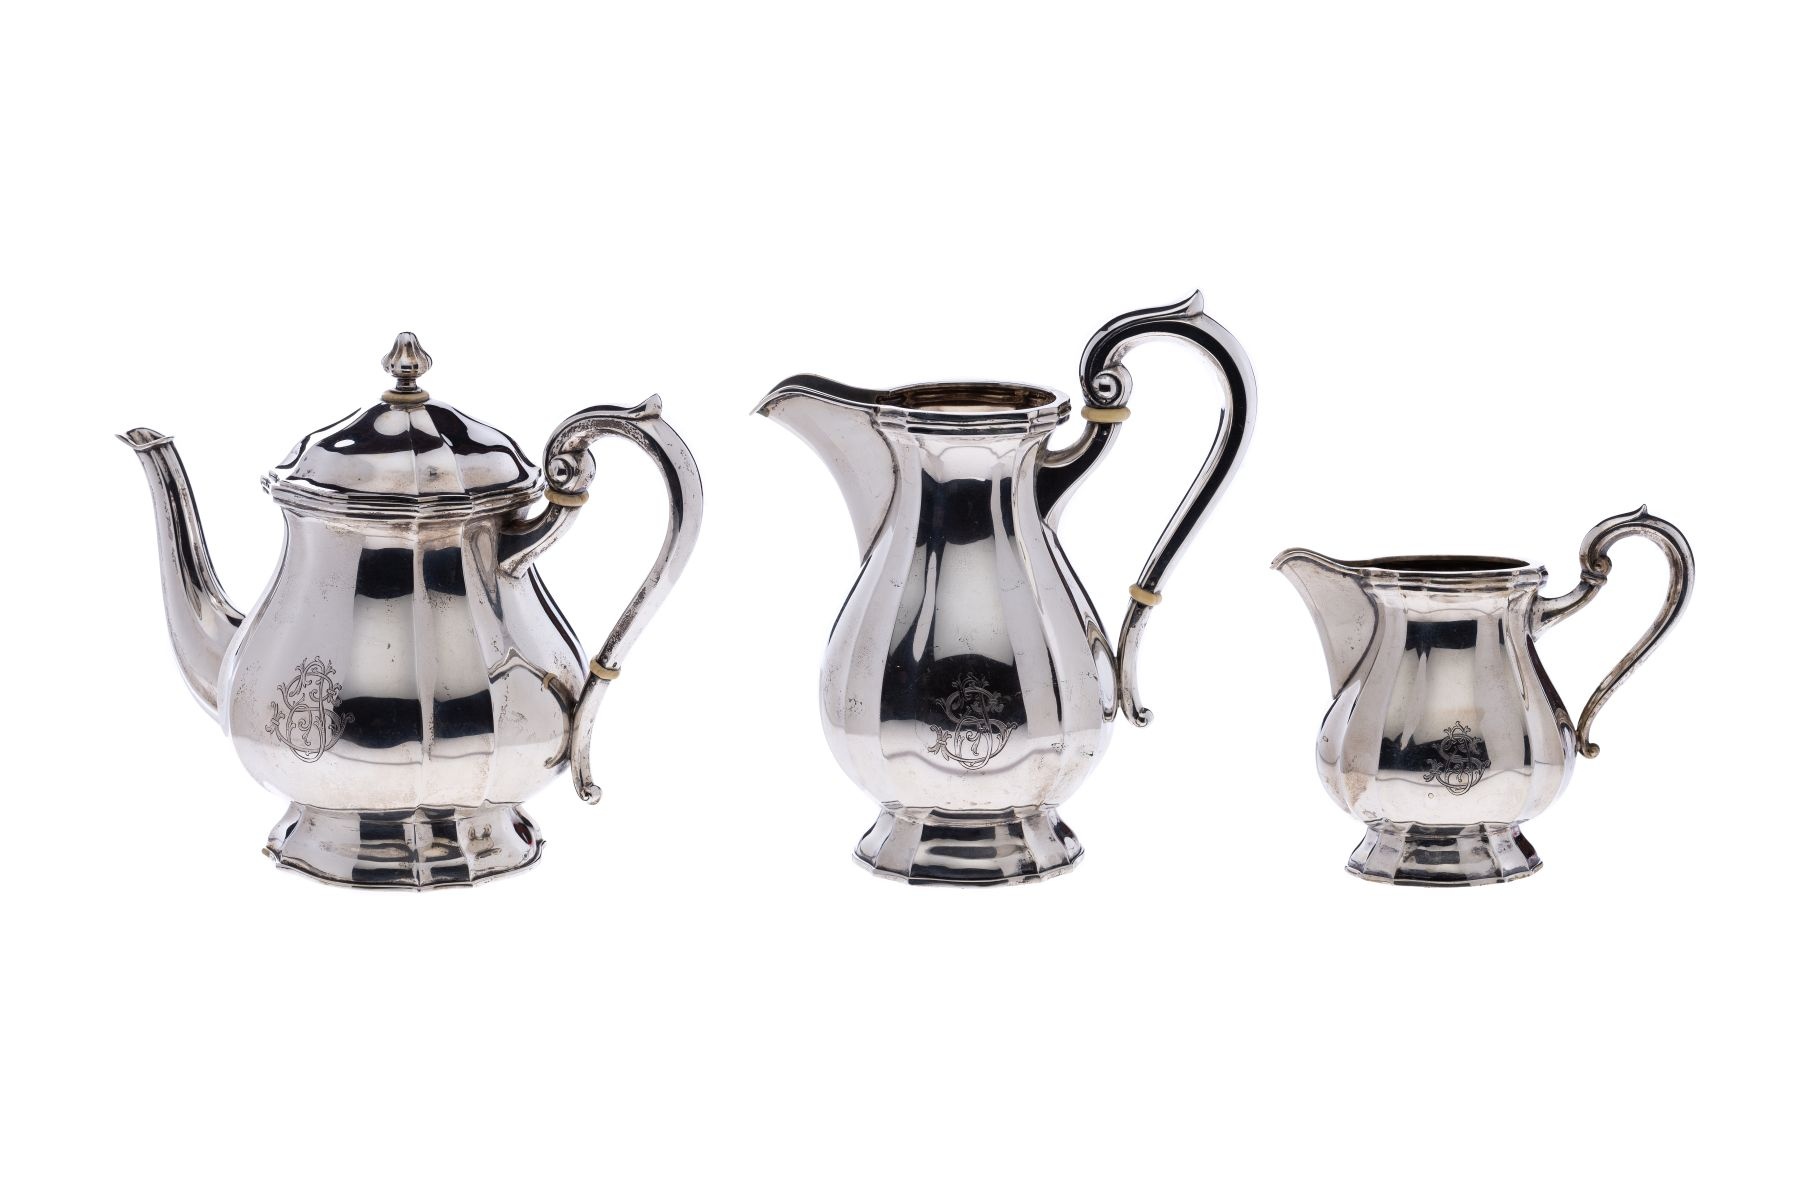 #1 Teapot, large milk jug, small milk jug | Teekanne, große Milchkanne, kleine Milchkanne Image